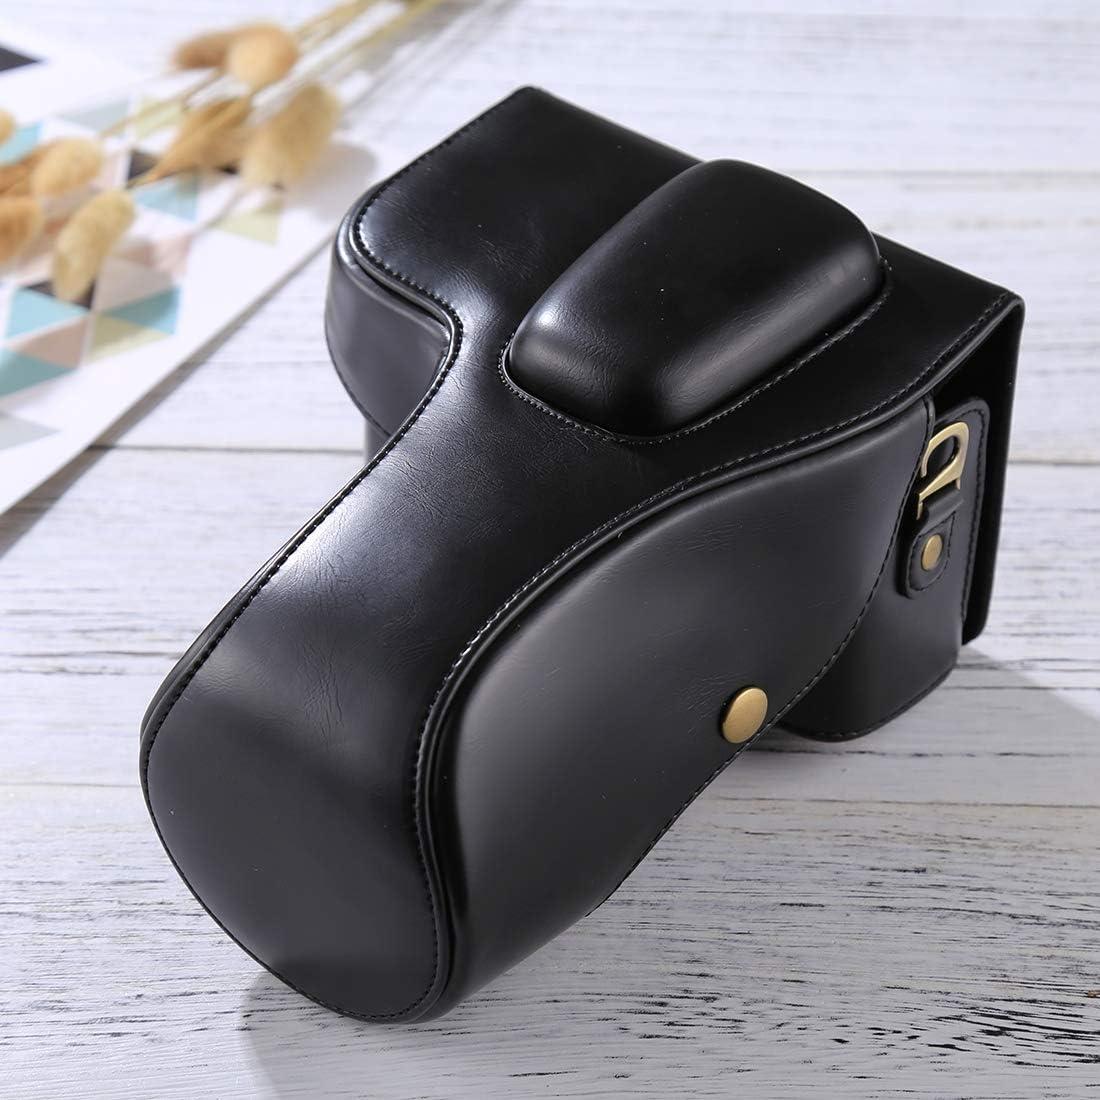 D3300 Color : Black ZQ House Full Body Camera PU Leather Case Bag for Nikon D3200 D3400 18-55mm // 18-105mm Lens